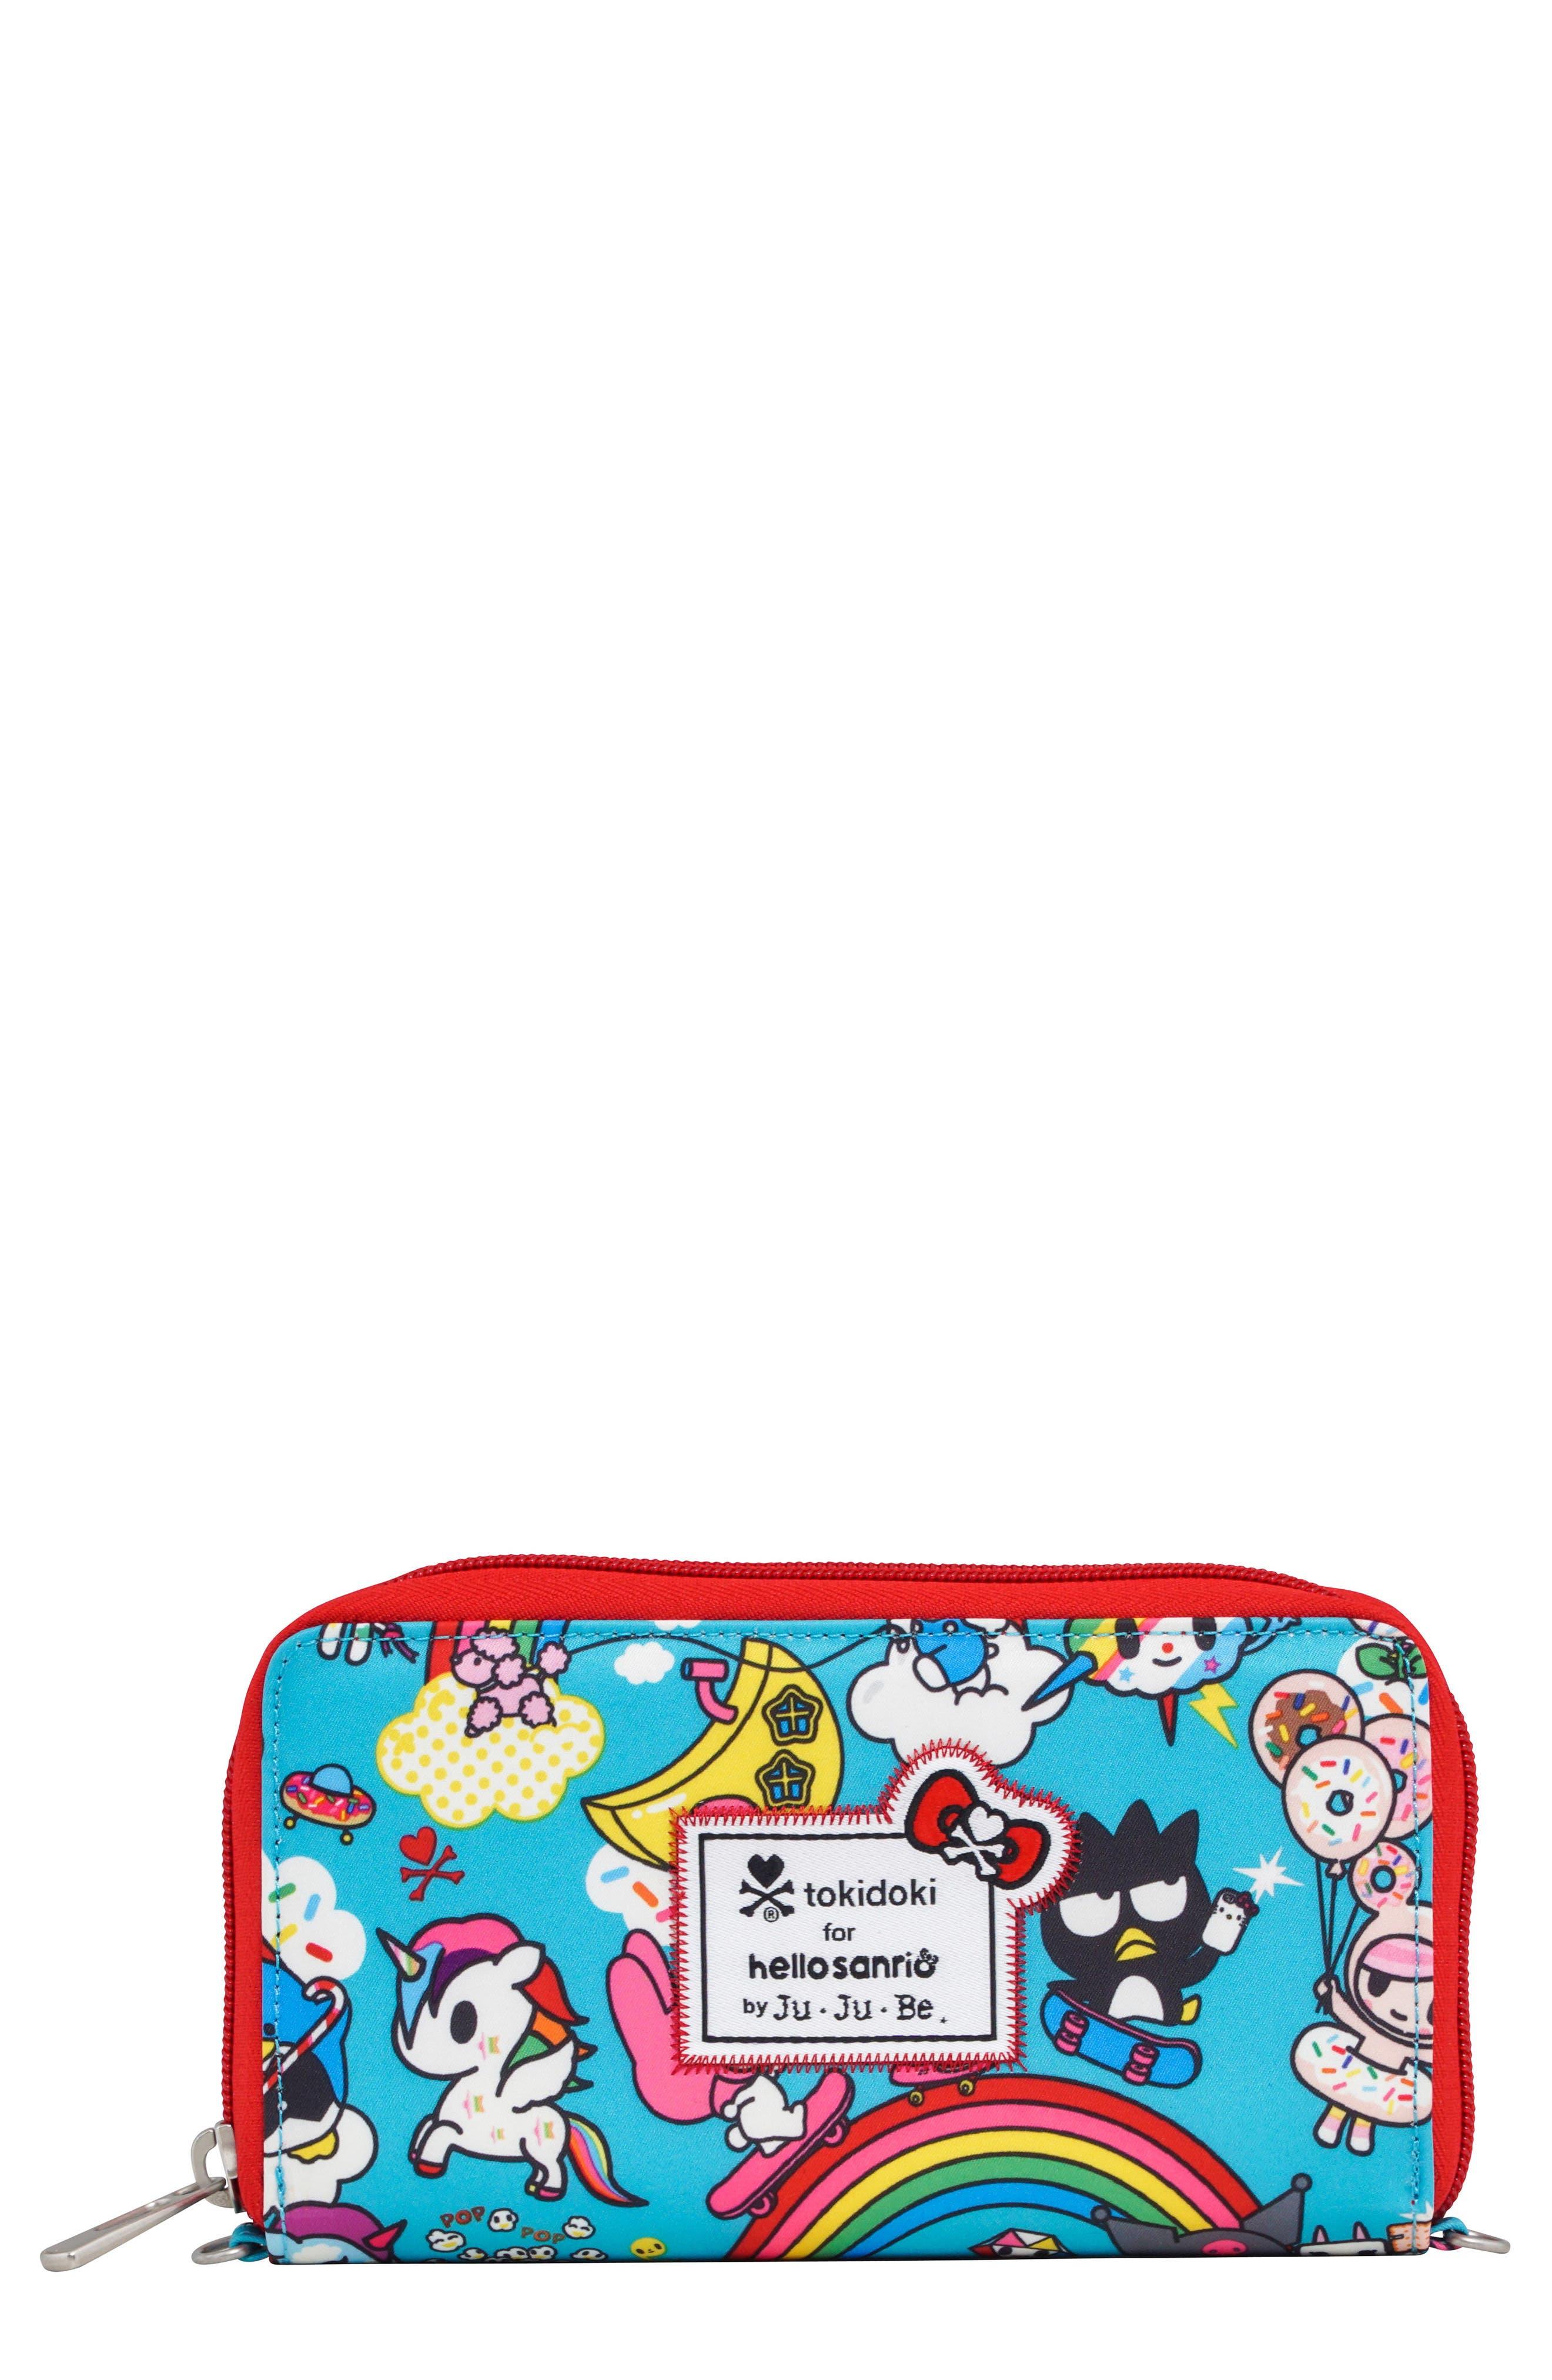 x tokidoki for Hello Sanrio Rainbow Dreams Be Spendy Clutch Wallet,                             Main thumbnail 1, color,                             Rainbow Dreams